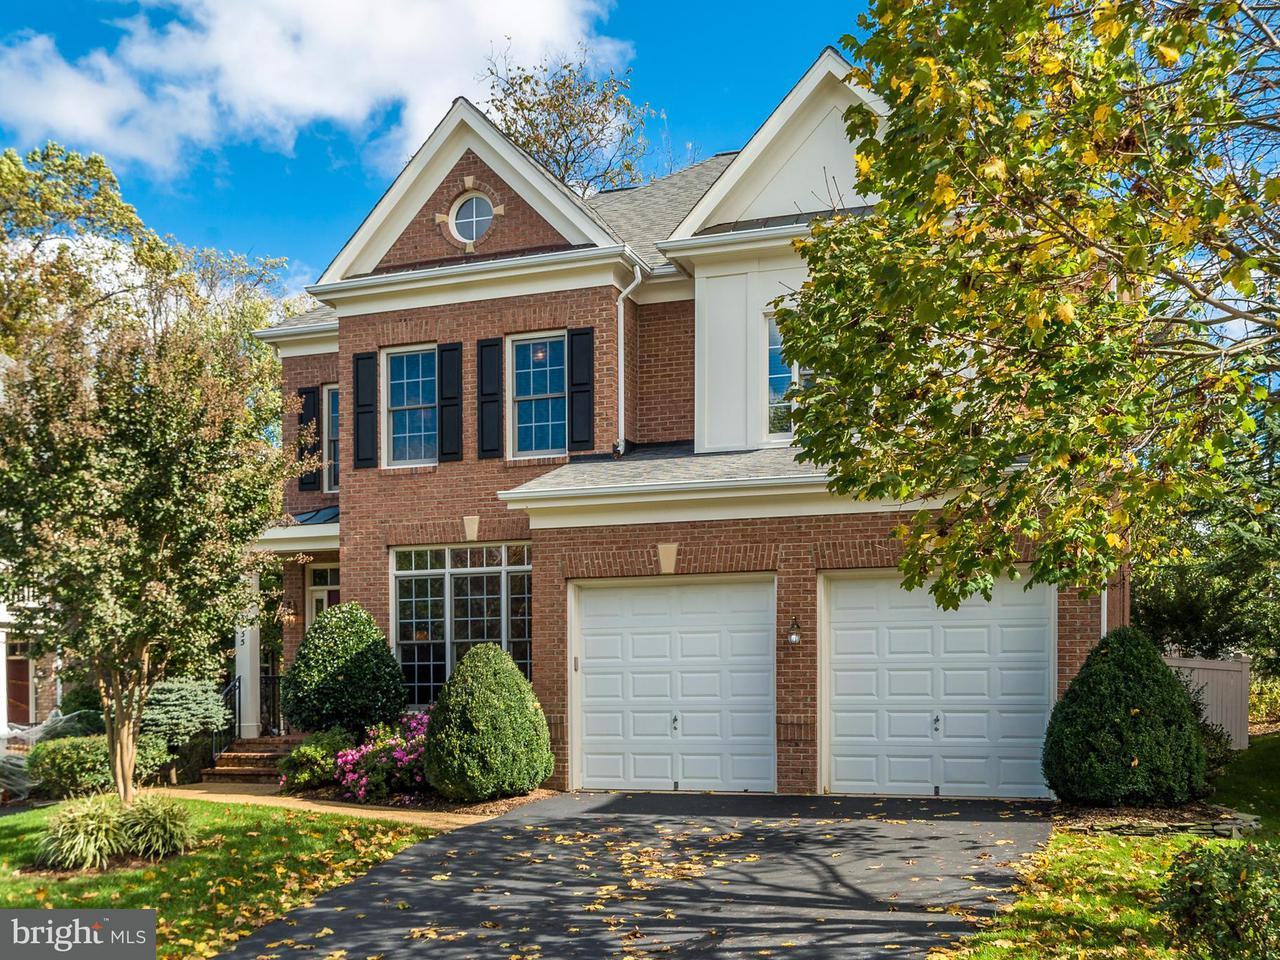 Single Family Home for Sale at 3835 FARRCROFT Drive 3835 FARRCROFT Drive Fairfax, Virginia 22030 United States